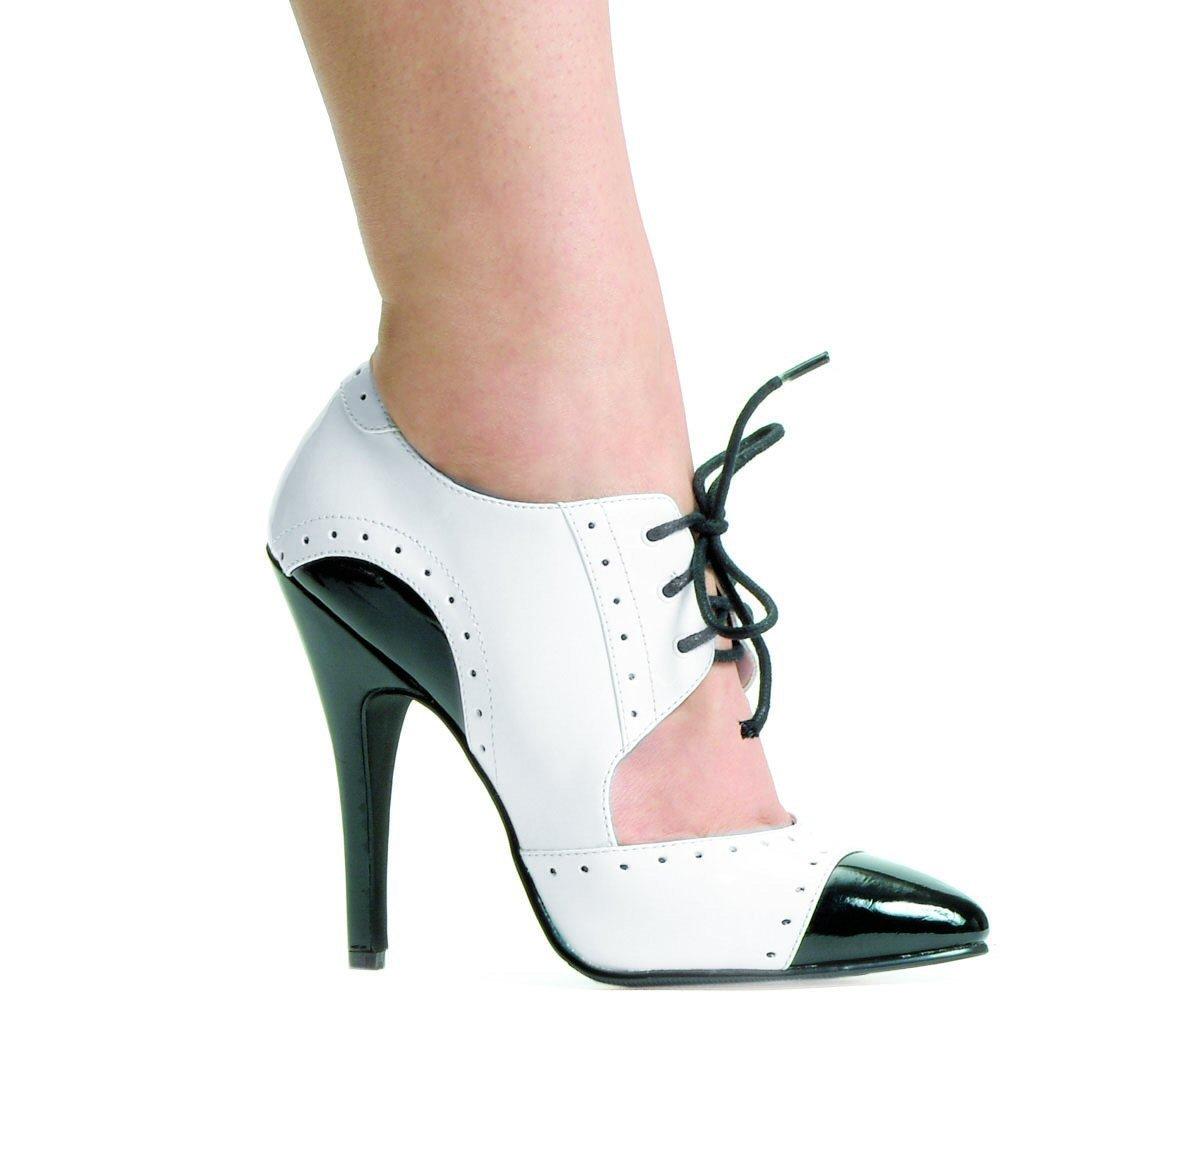 Ellie 511-Gangster women's pointy toe oxford pumps 5 inch heels white/black size 9